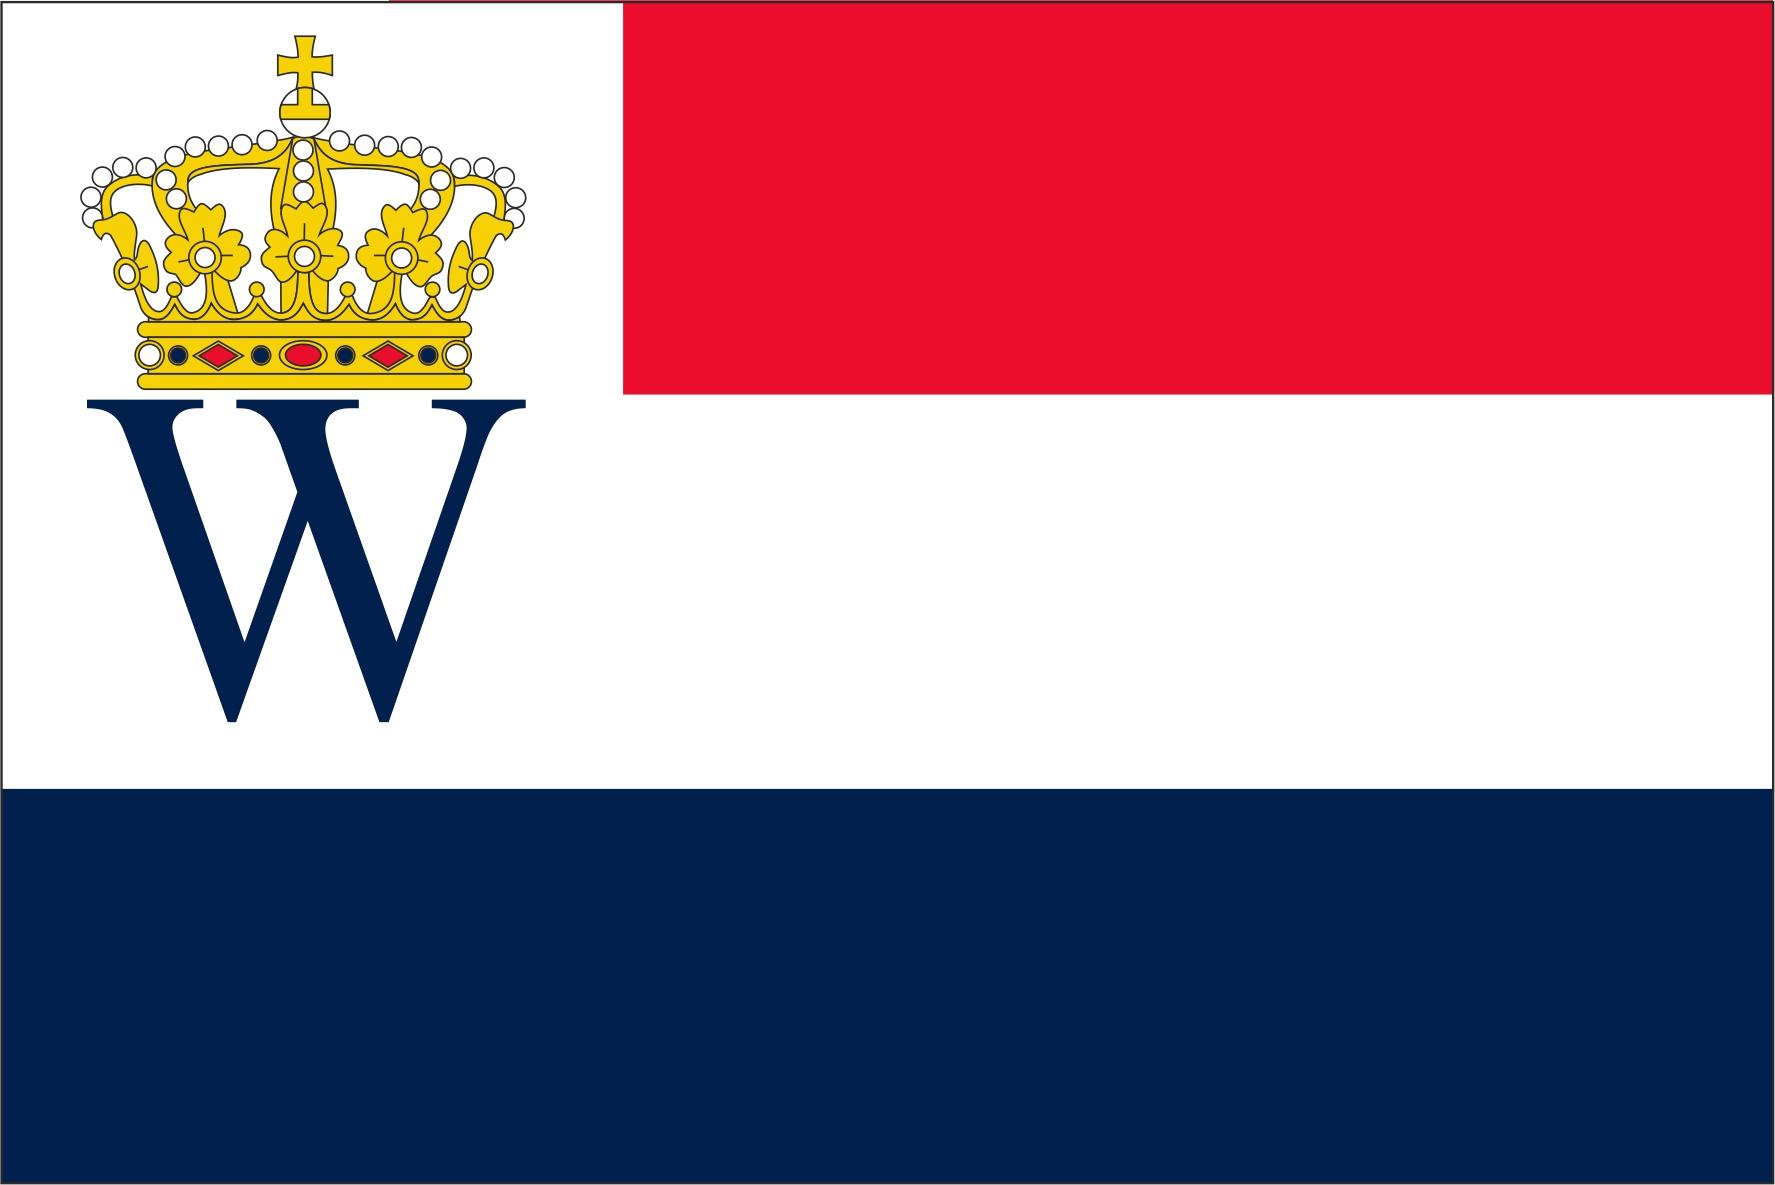 Koninklijke Watersport Vlag 80x120cm Oud hollands Marineblauw